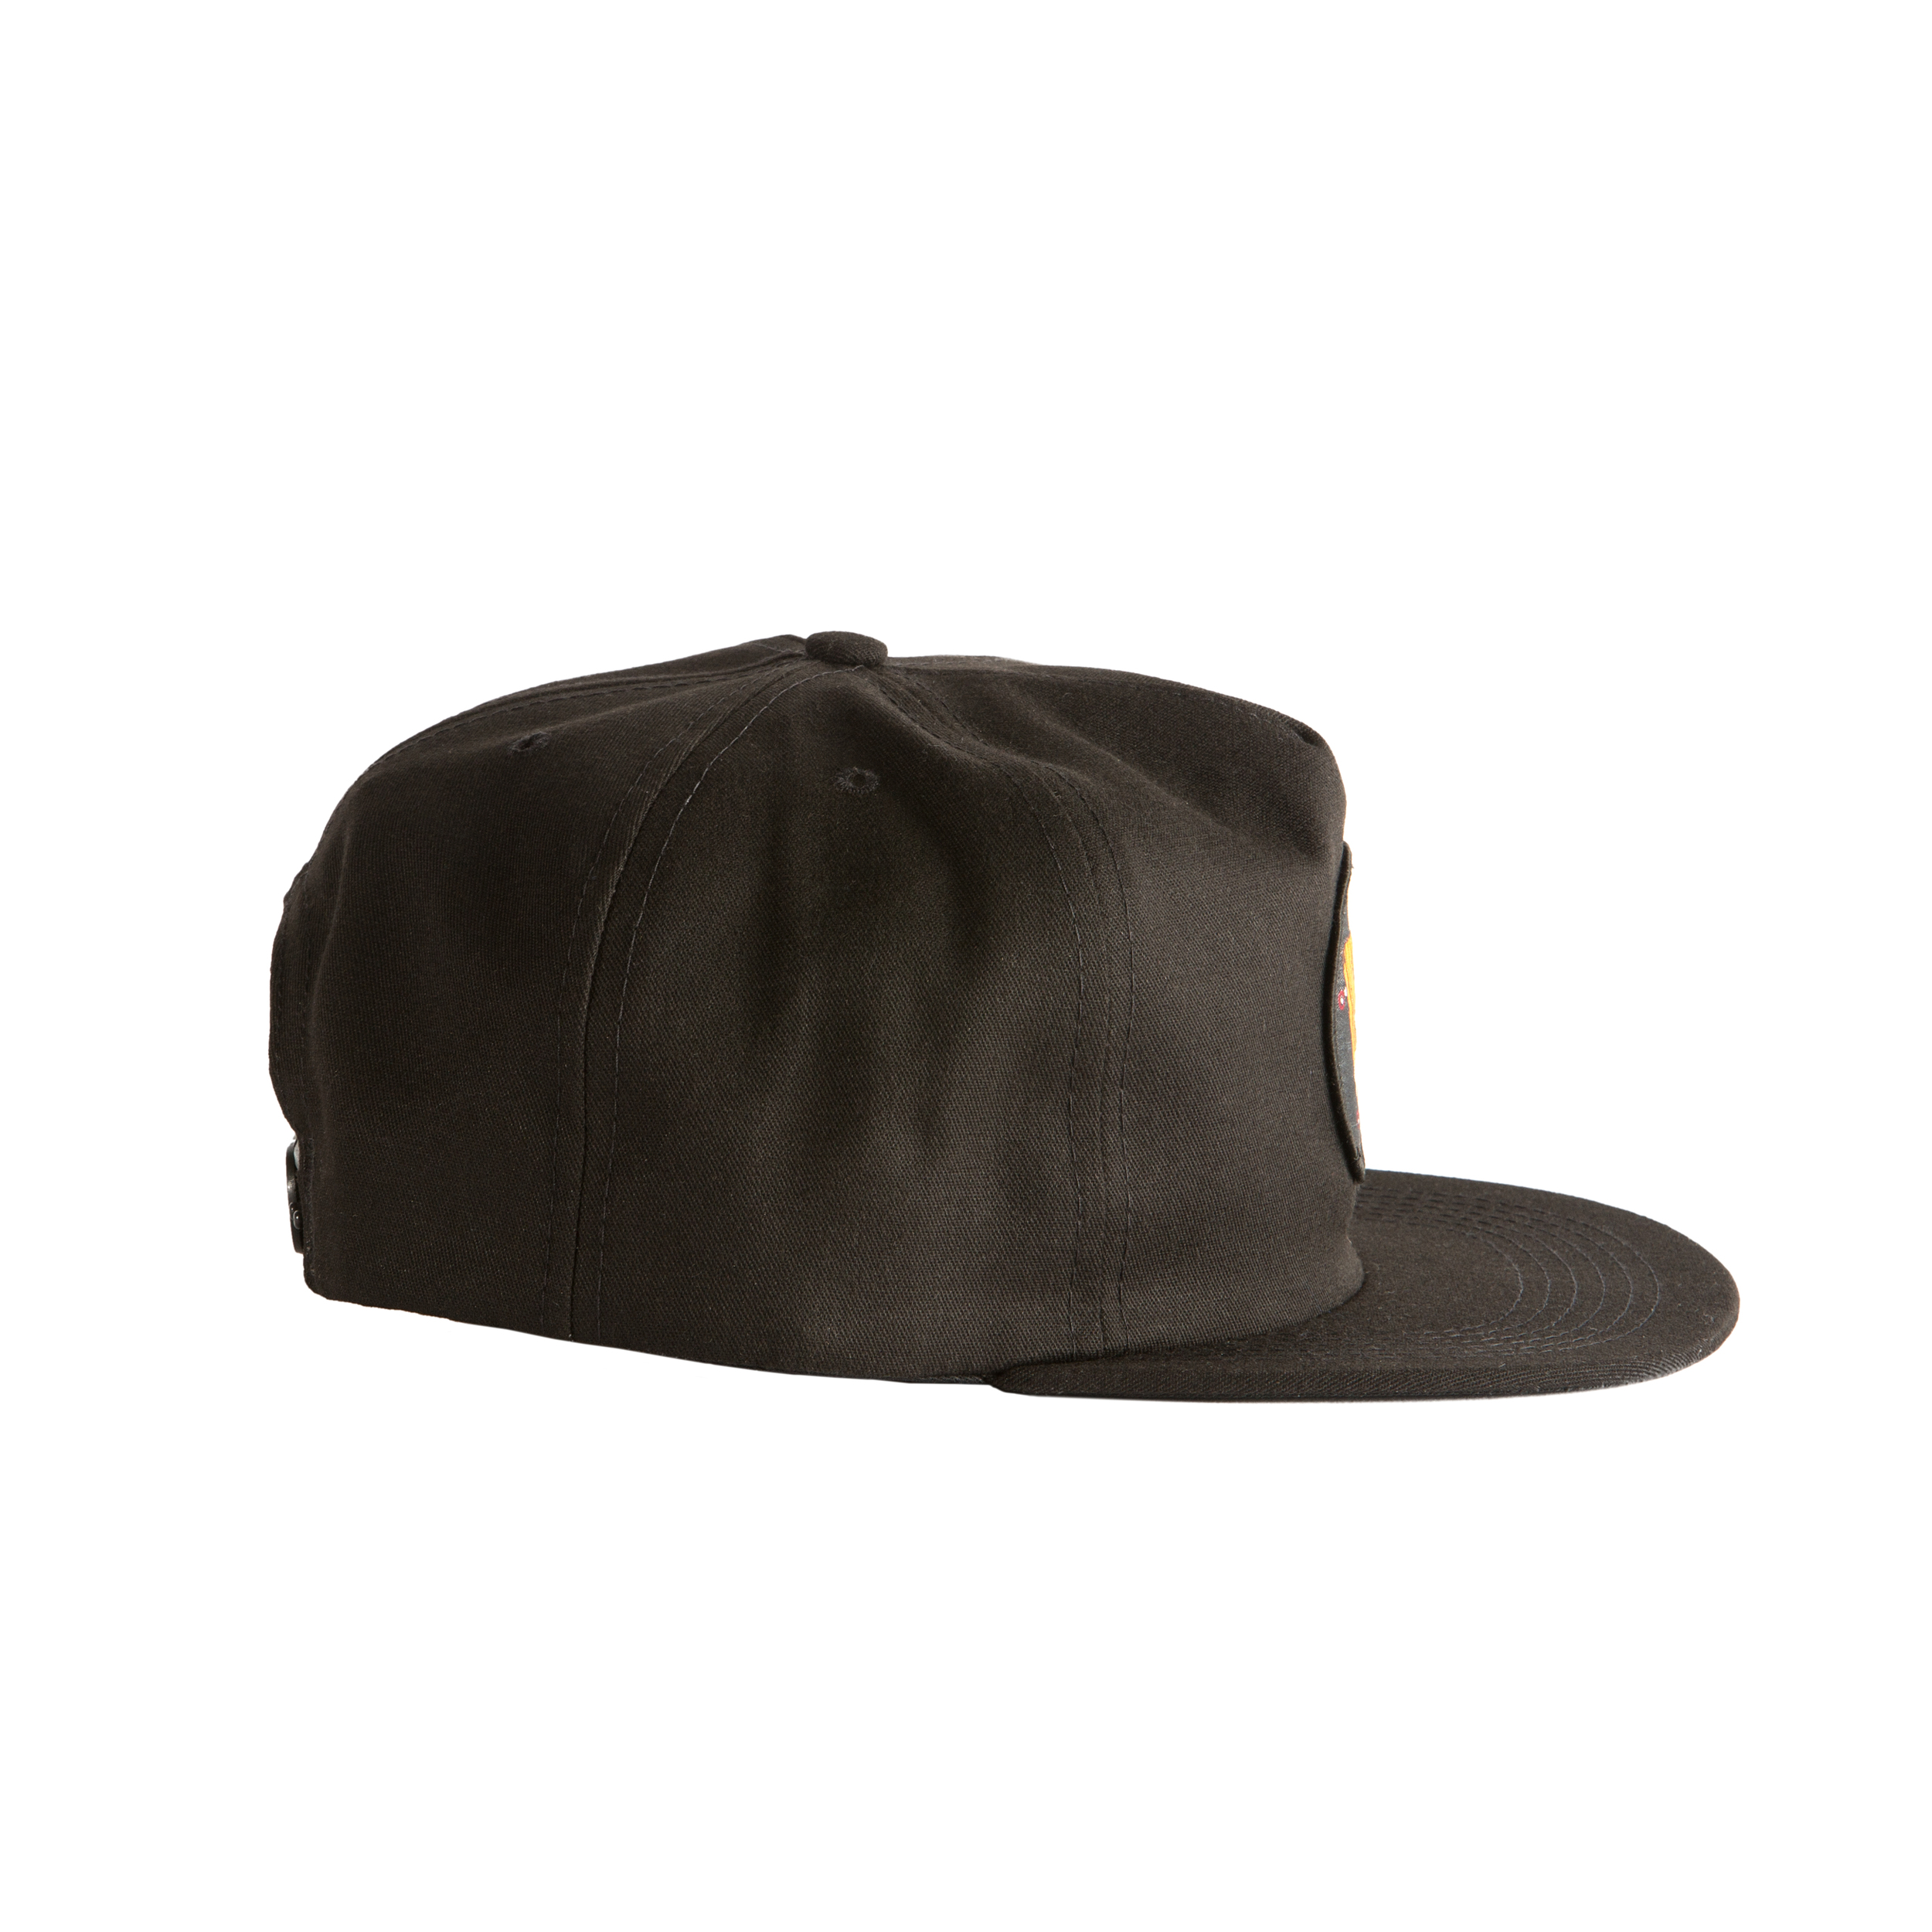 Blk-Hugger-Hat-3.jpg